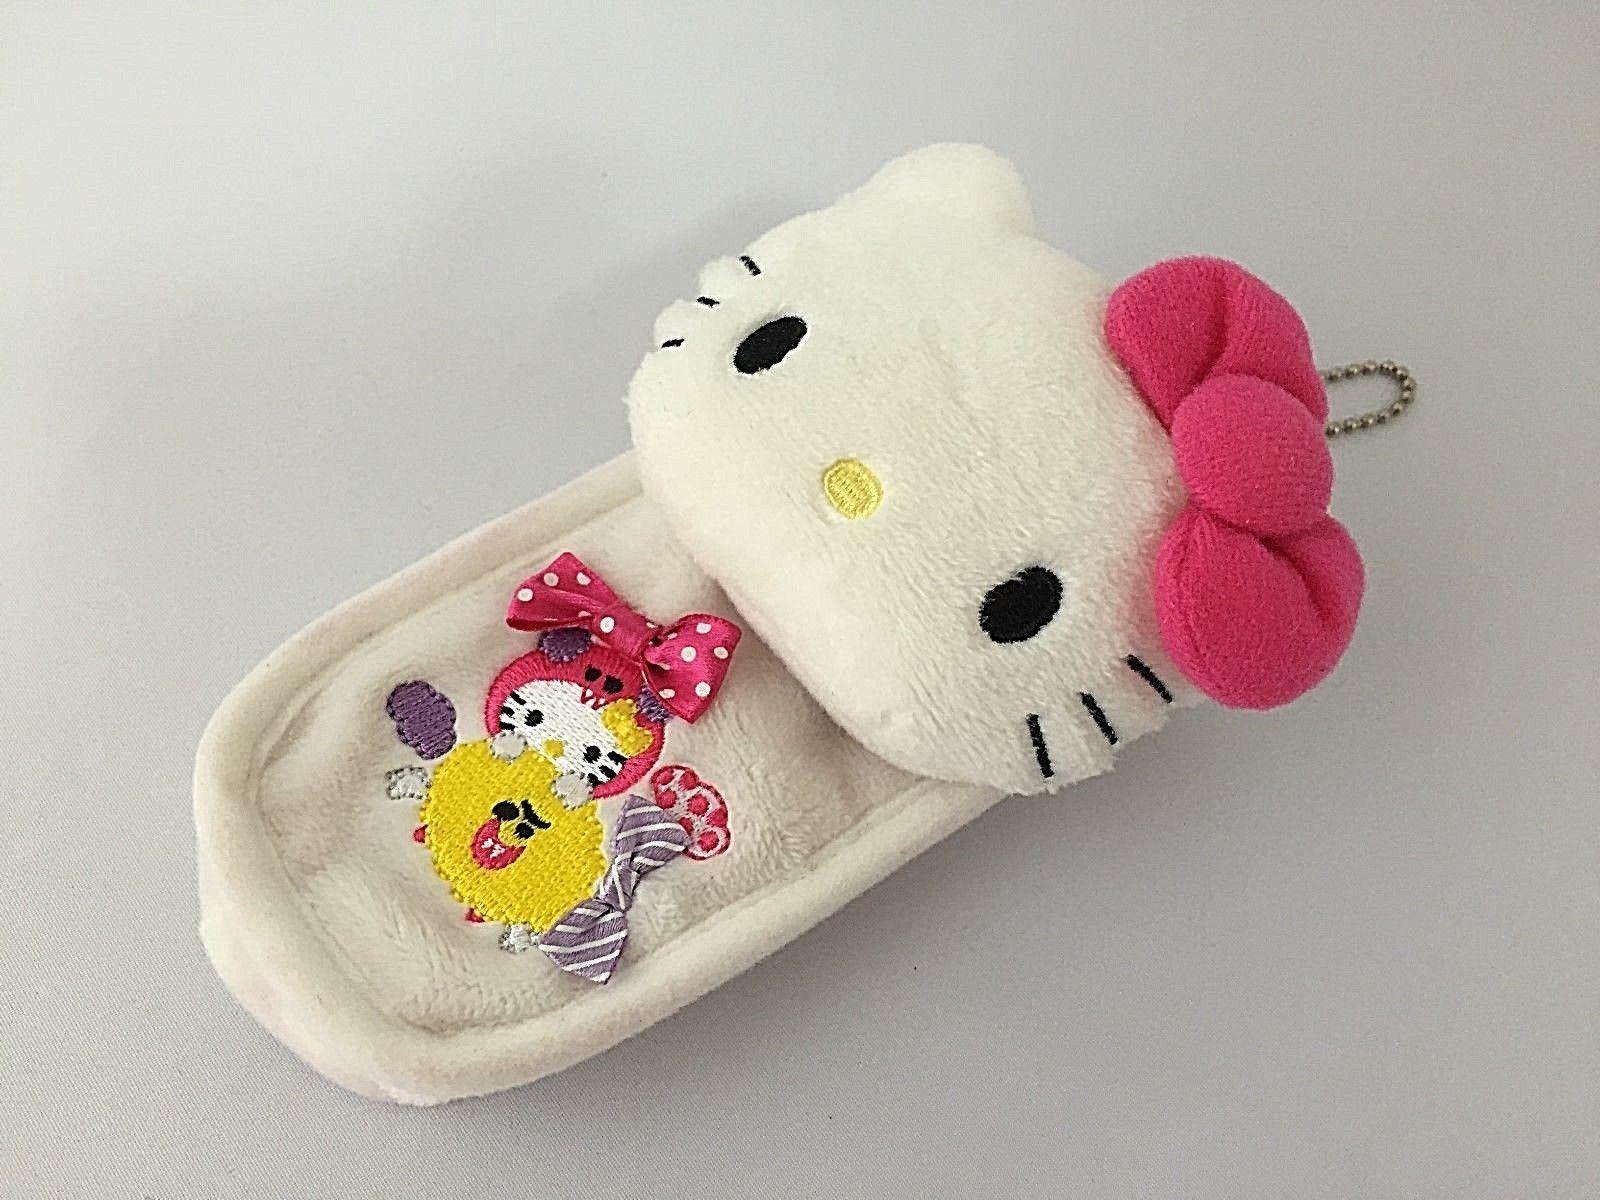 Hello Kitty Plush Case Pouch Face Mascot Strap Sanrio Japan  https://t.co/YOq0W9a7EE https://t.co/mMnqhwMY2K